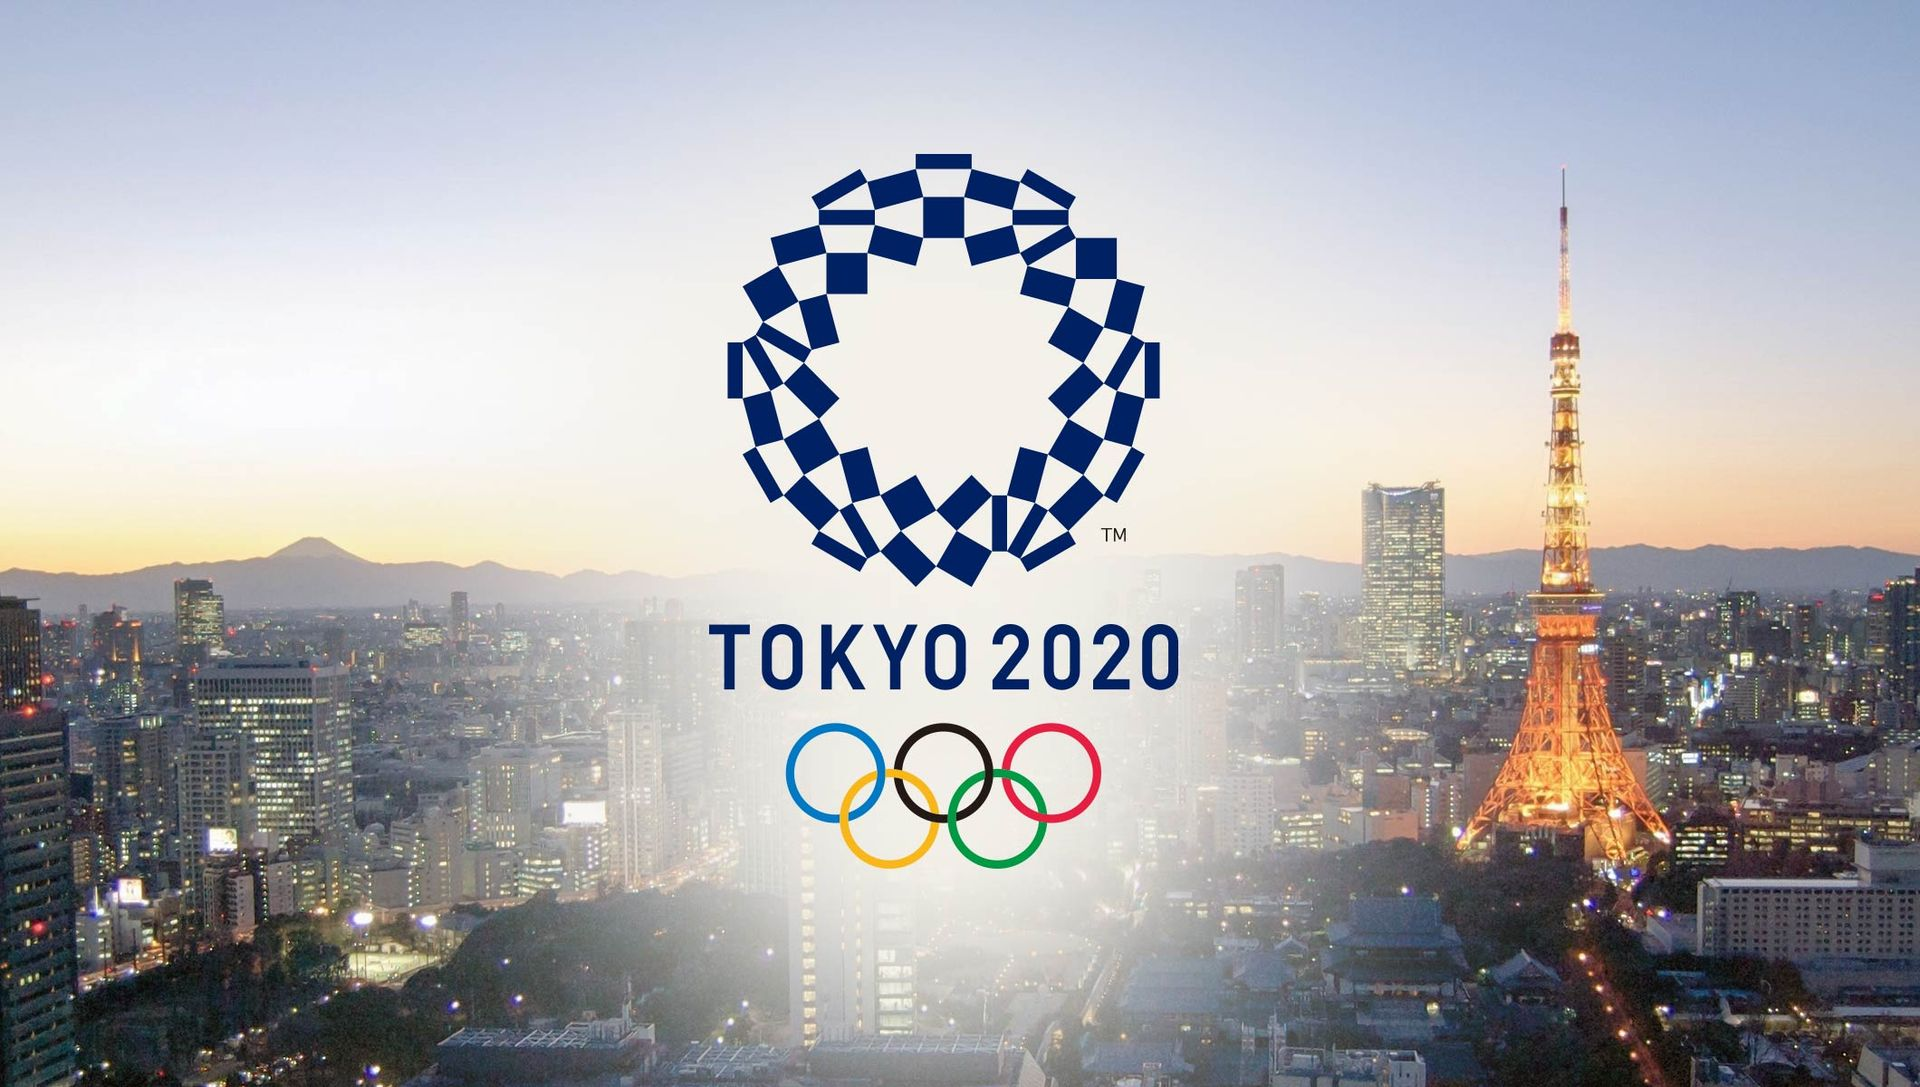 Sommar-OS i Tokyo blir rökfritt